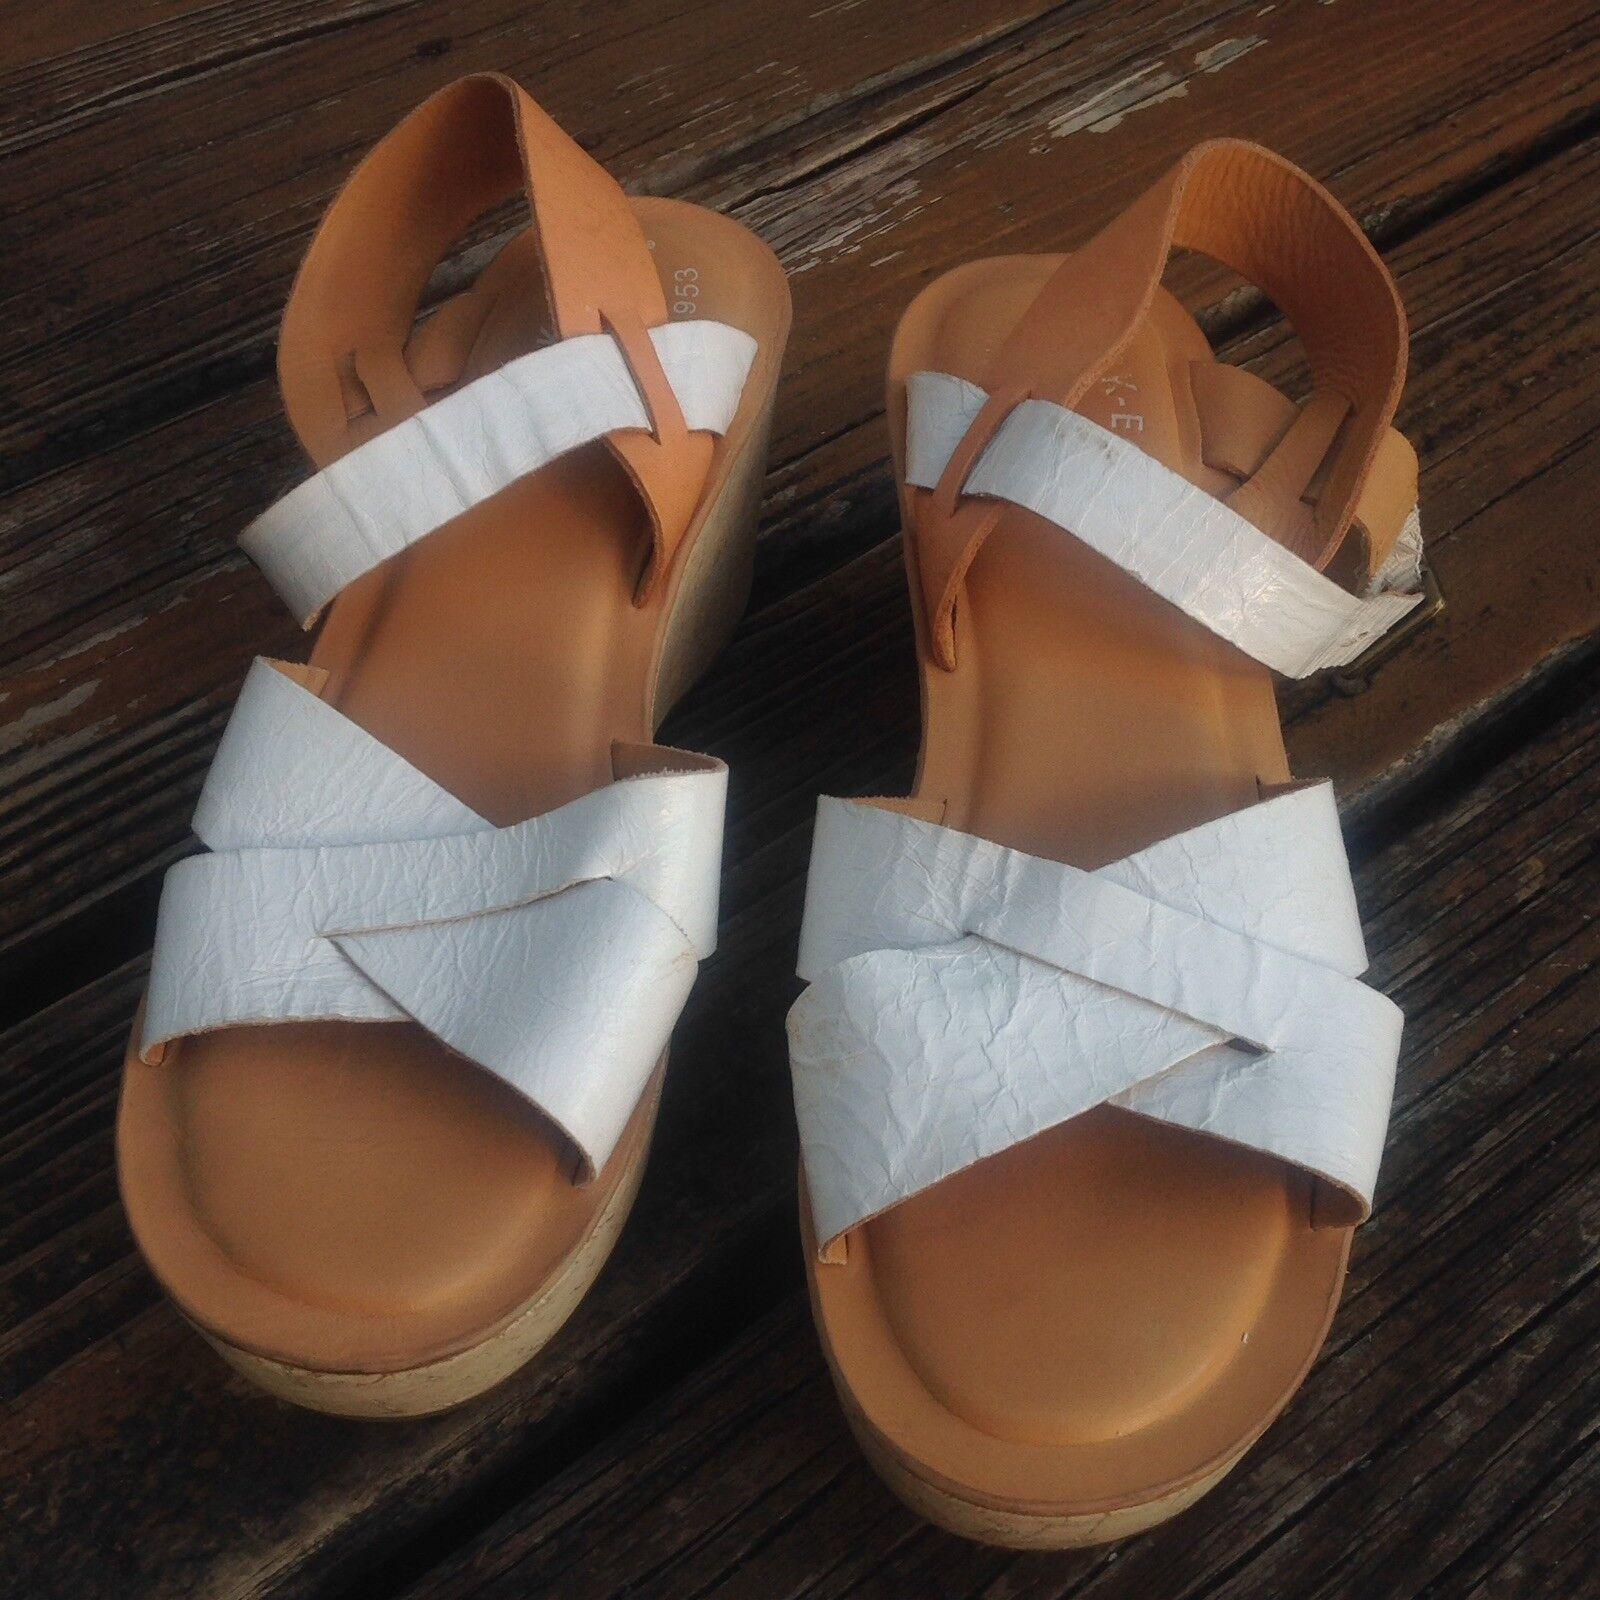 Zapatos de cuero KORKS Kork ease ease ease blancoo Habano Cuña Sandalias De Plataforma para mujer 9 EU 40.5  bienvenido a comprar